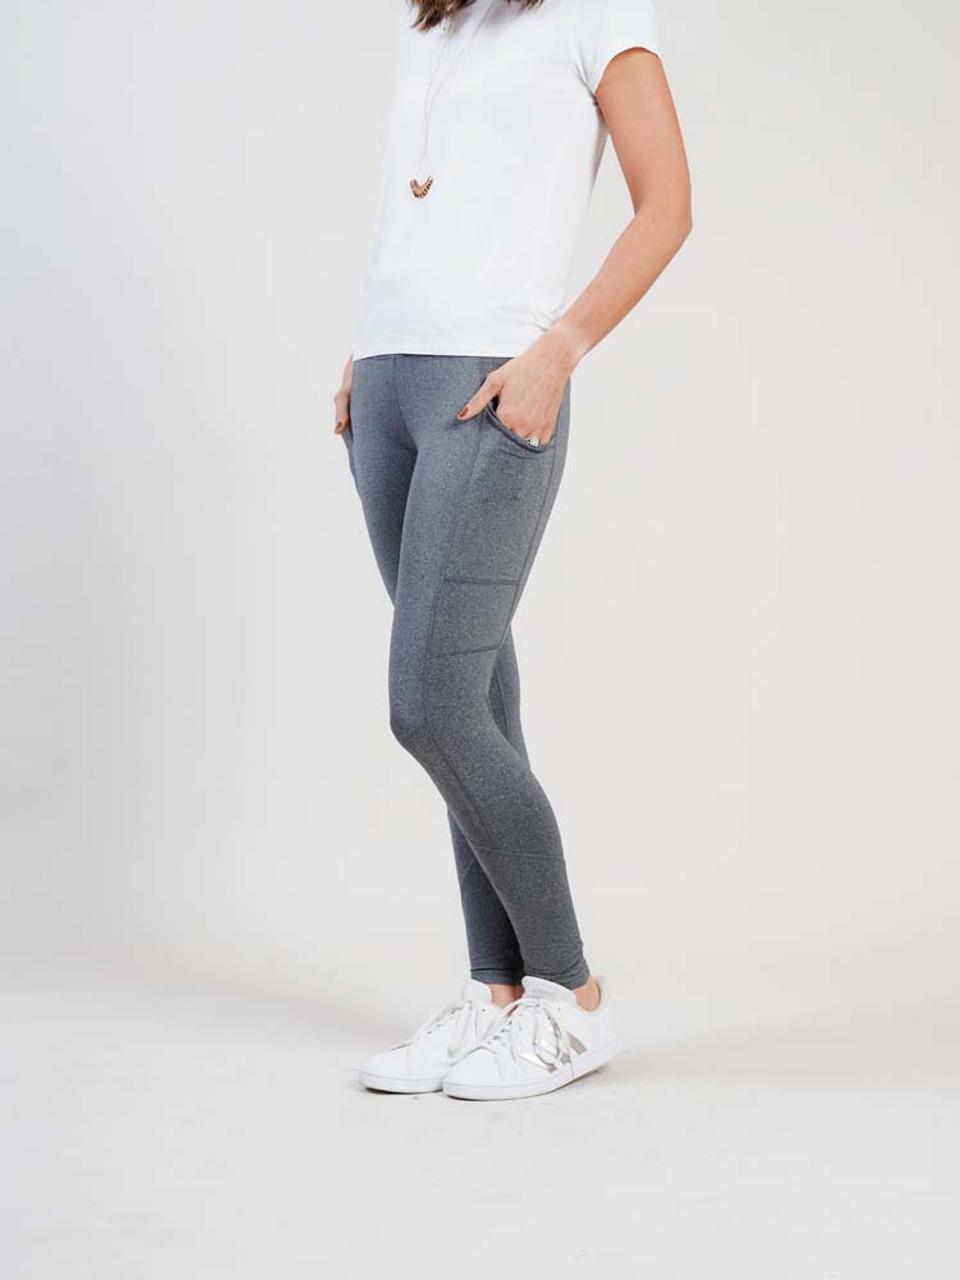 grey athletic leggings